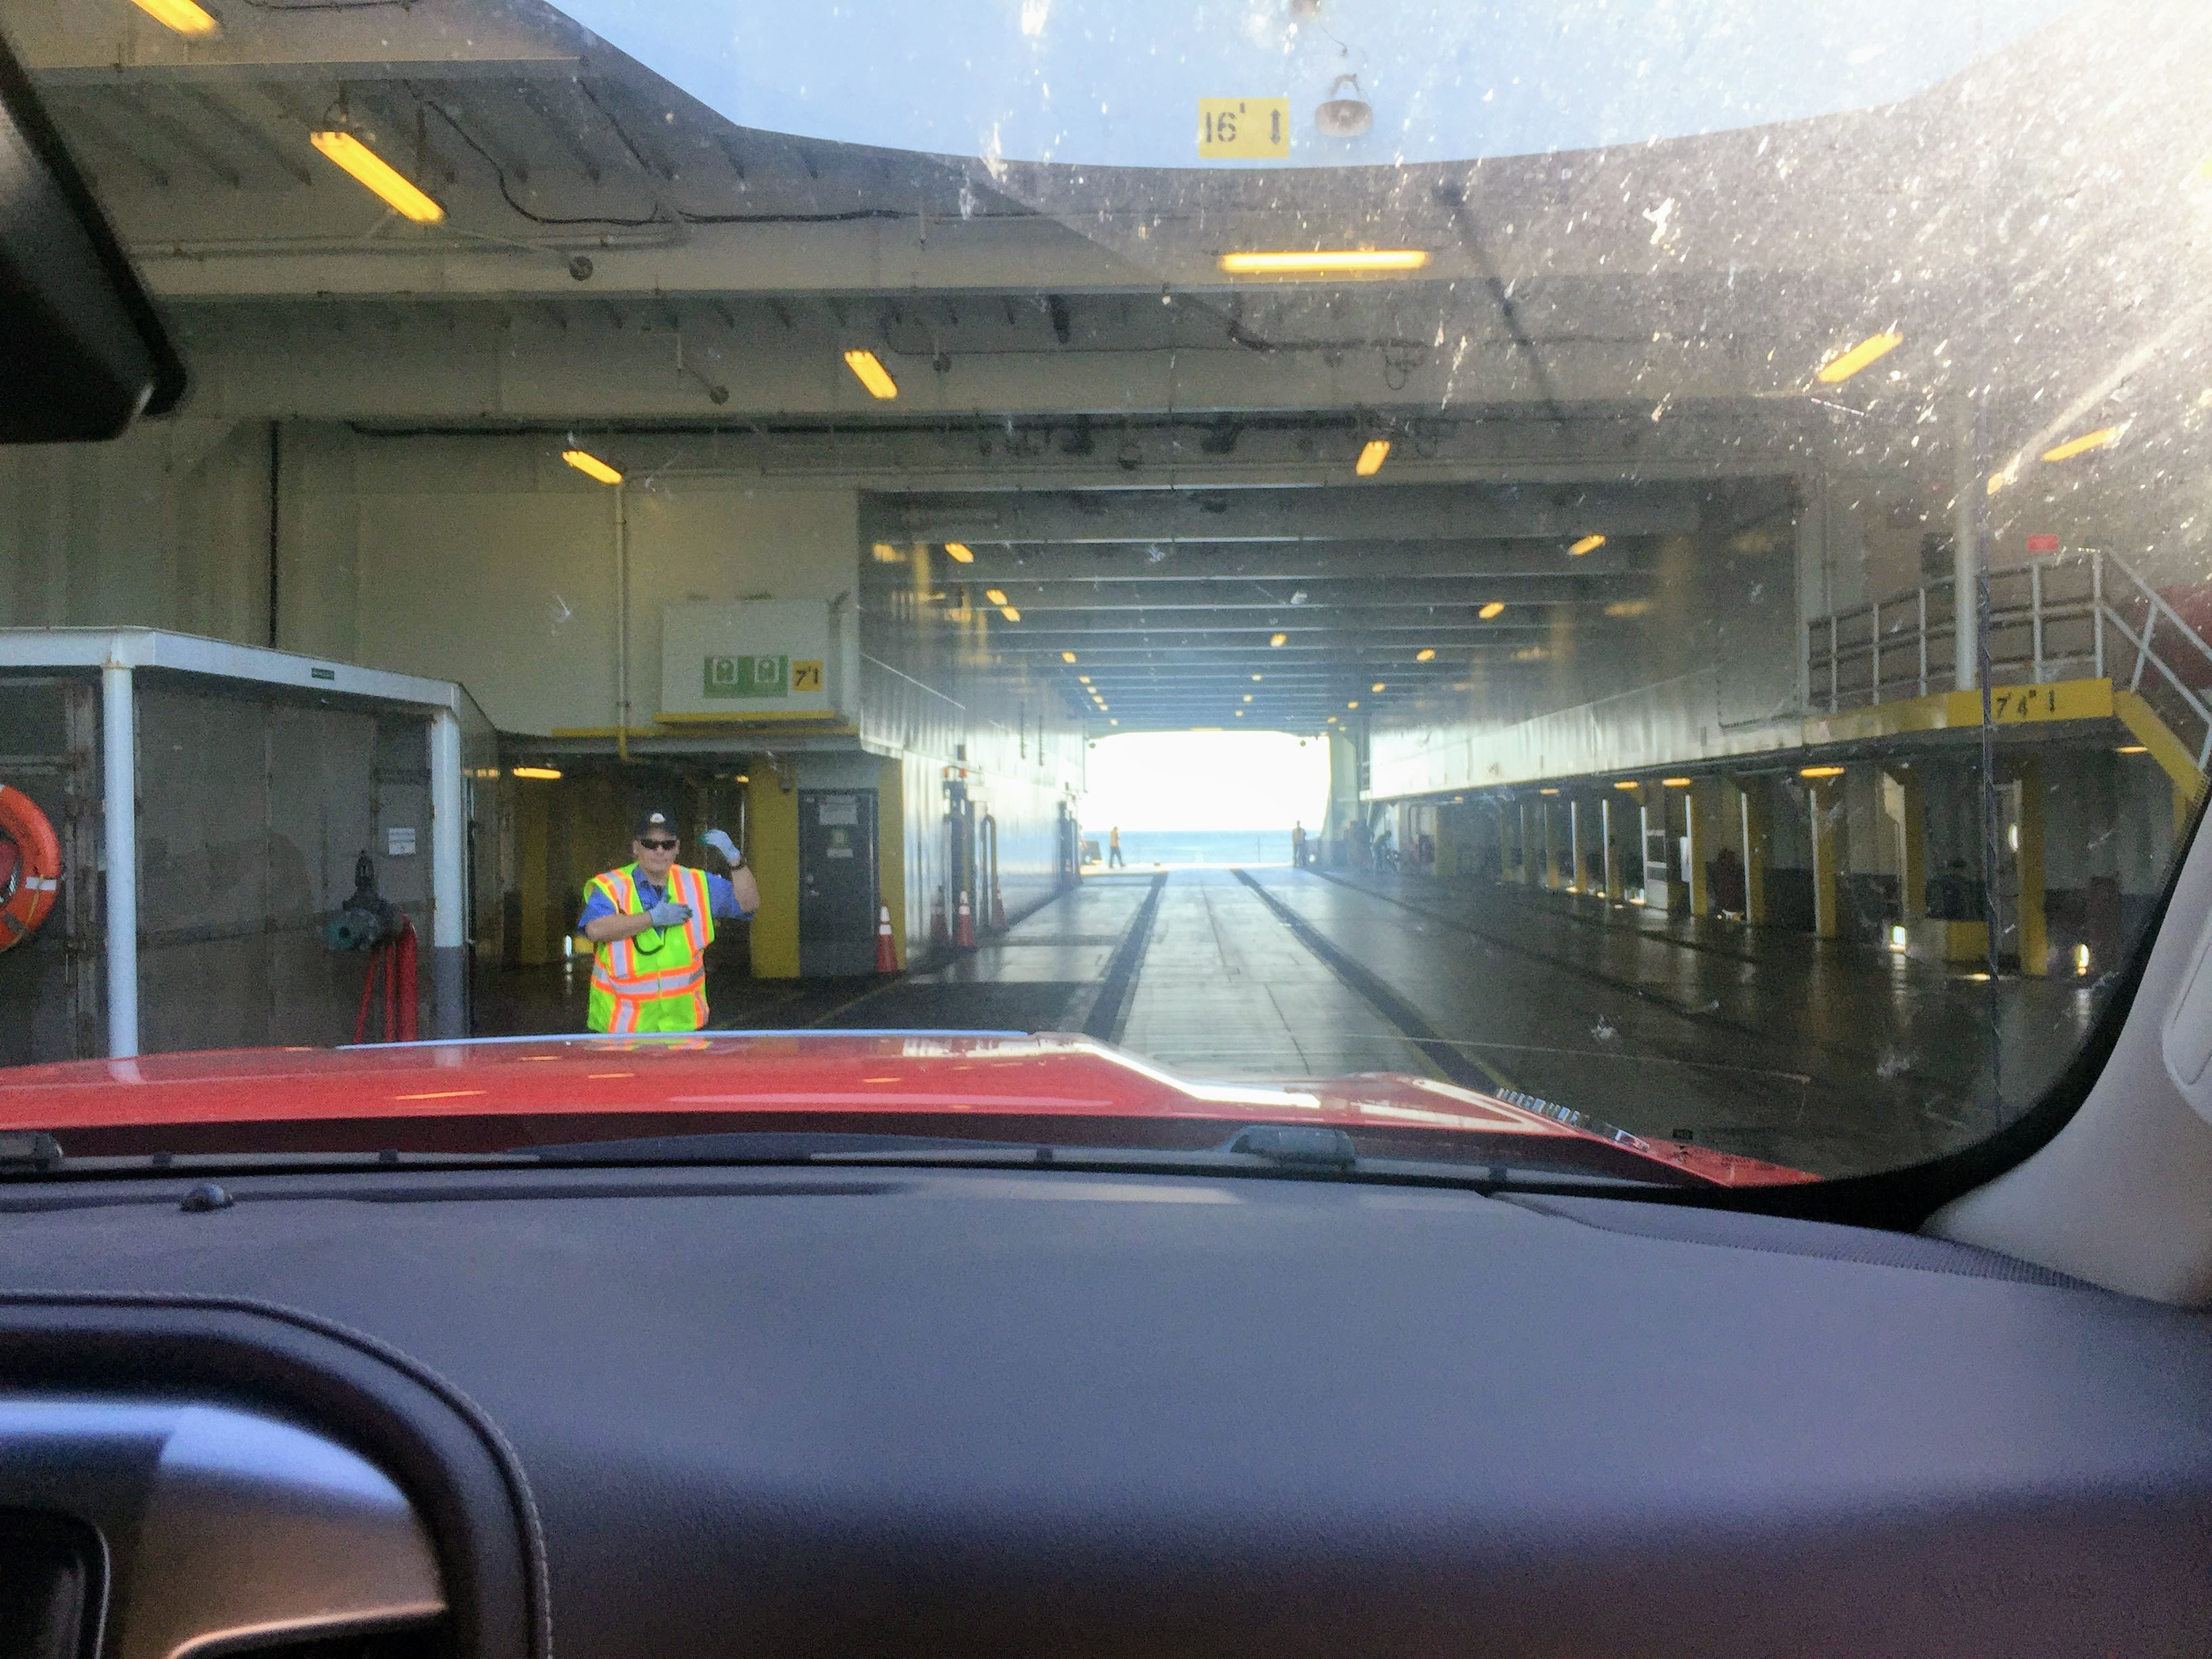 2017-09-28 Washington 01 Ferry 04